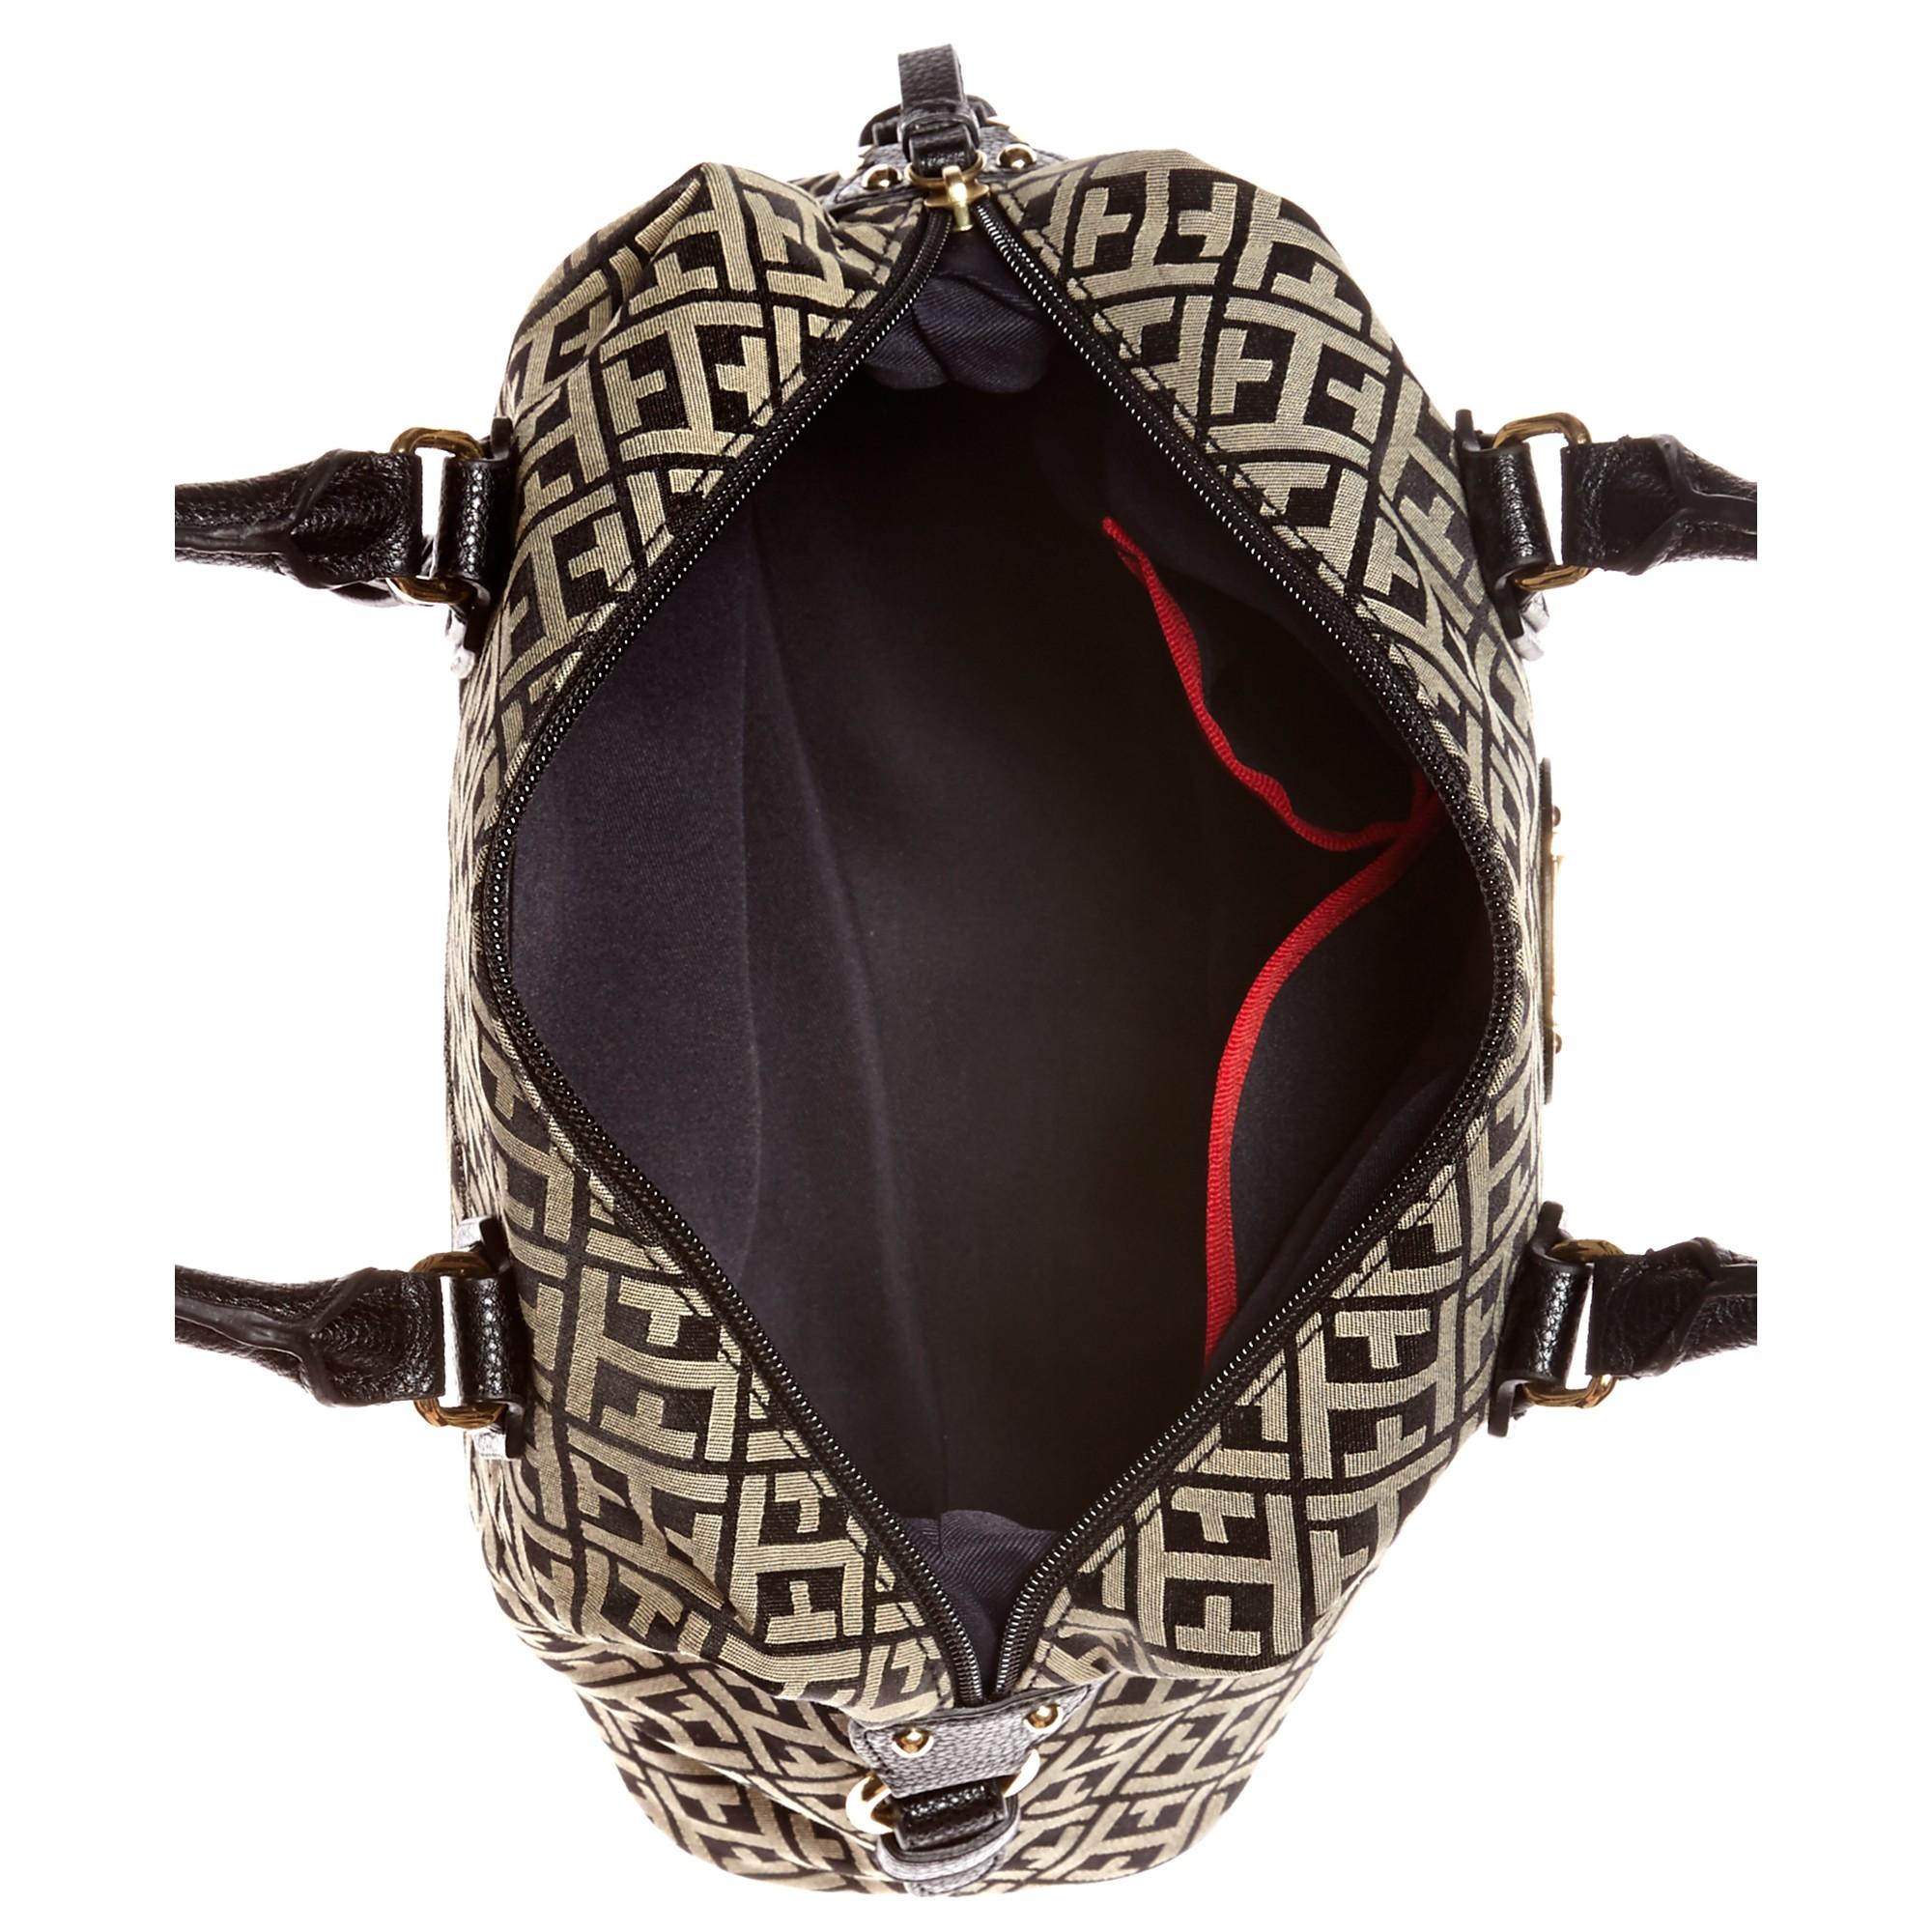 e3ad5d5d809d Tommy Hilfiger Black Keepsake Signature Jacquard Bowler Bag